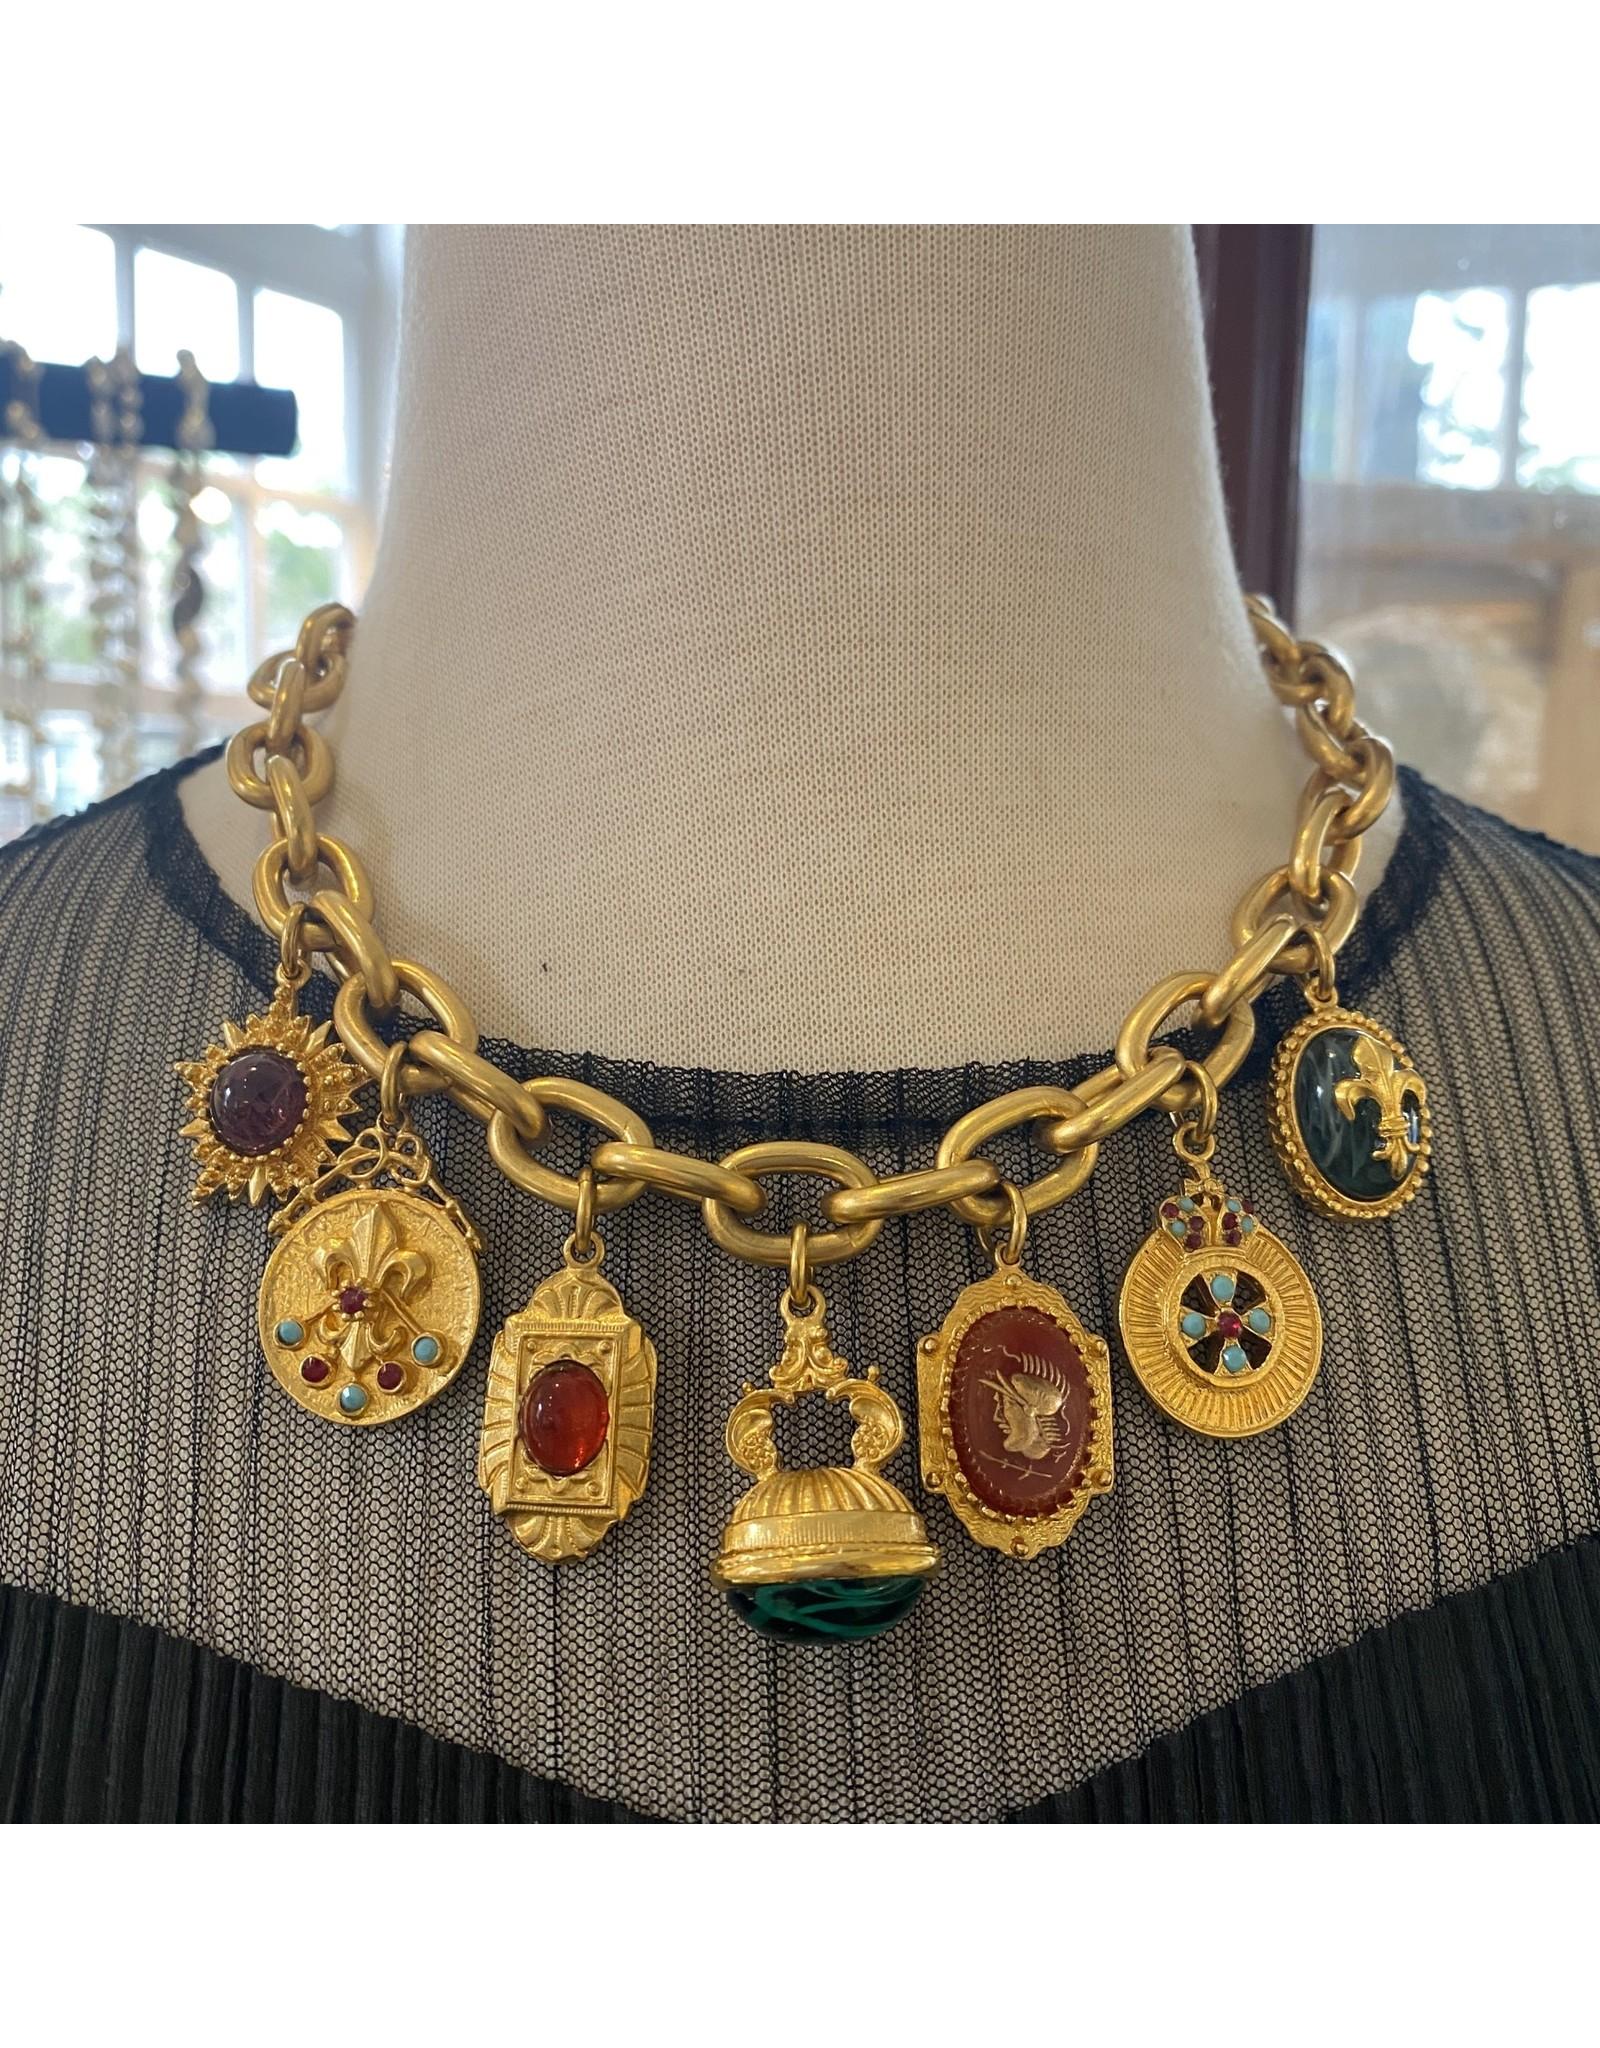 Ben-Amun ben/11713/gold/chain/wintag/pendants